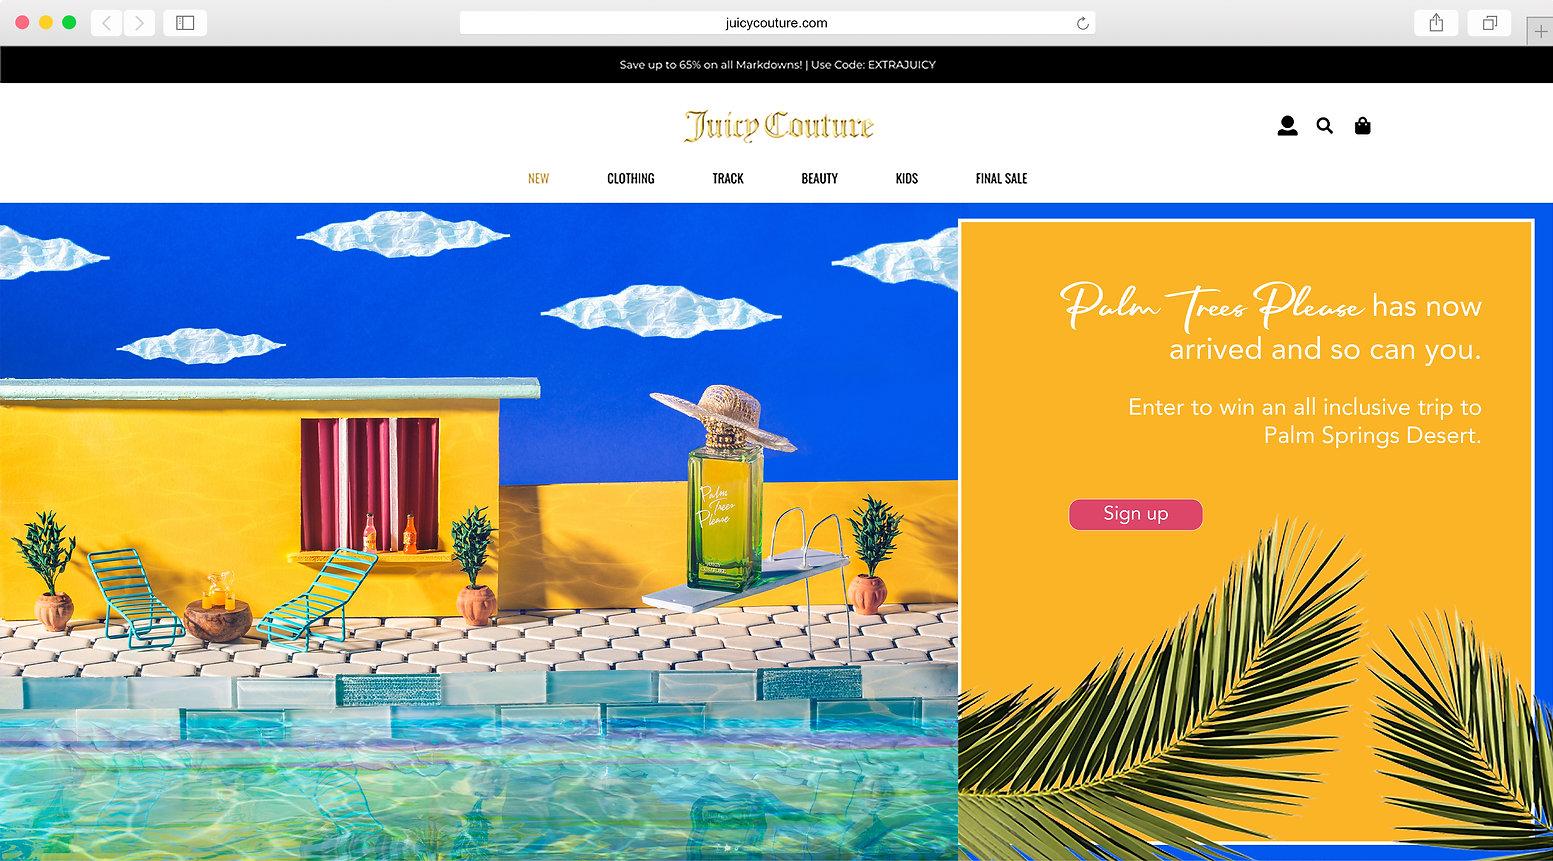 site_browser_mocked.jpg